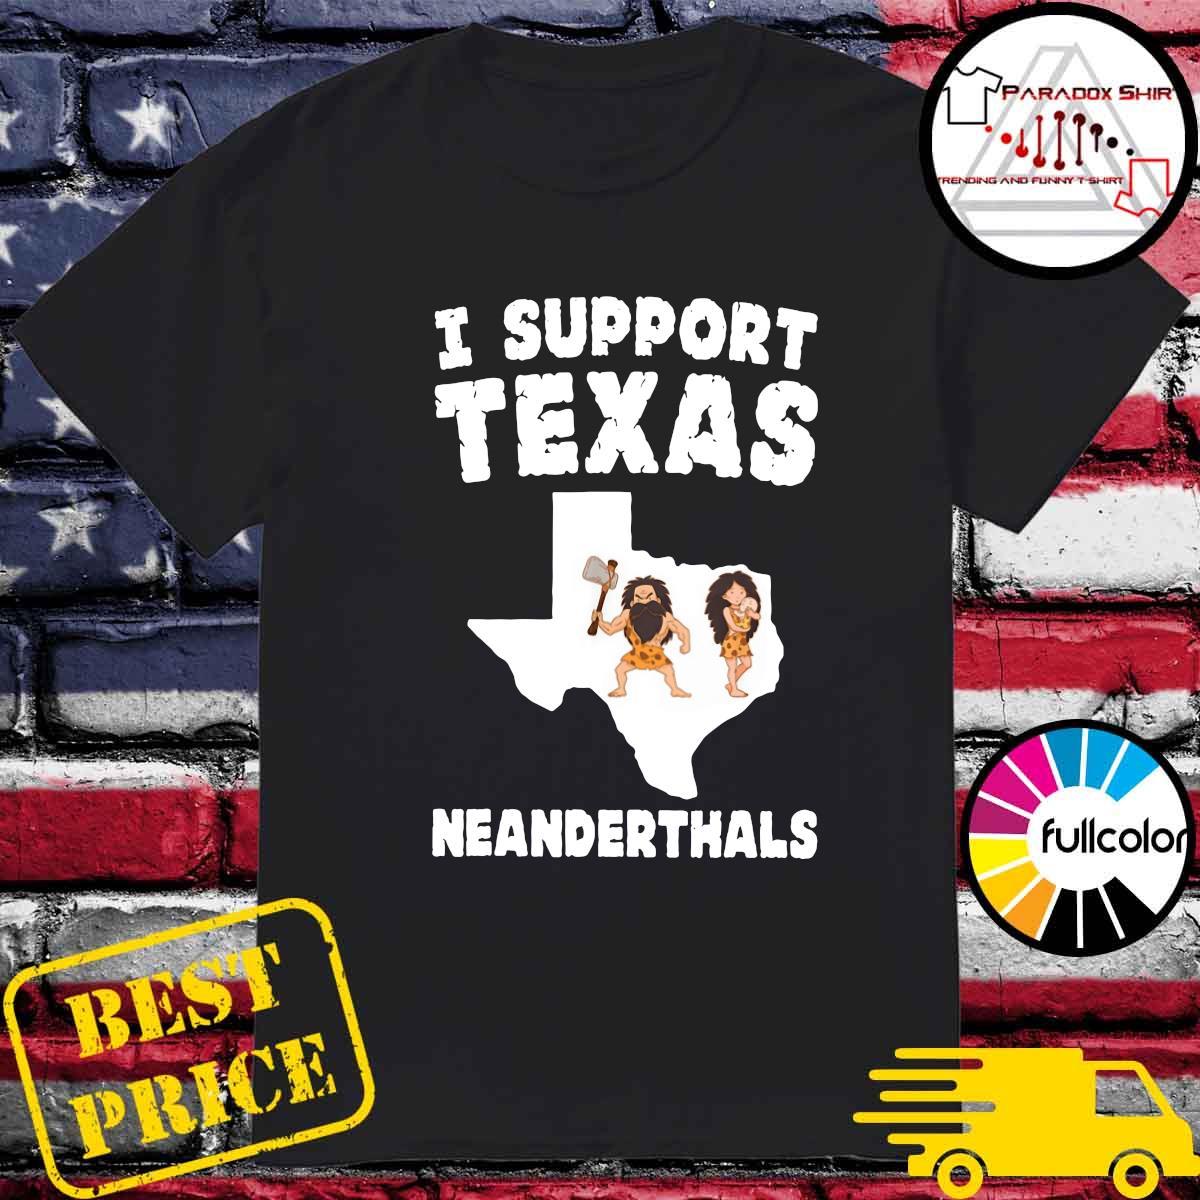 I Support Texas Neanderthals - Texas Map Shirt